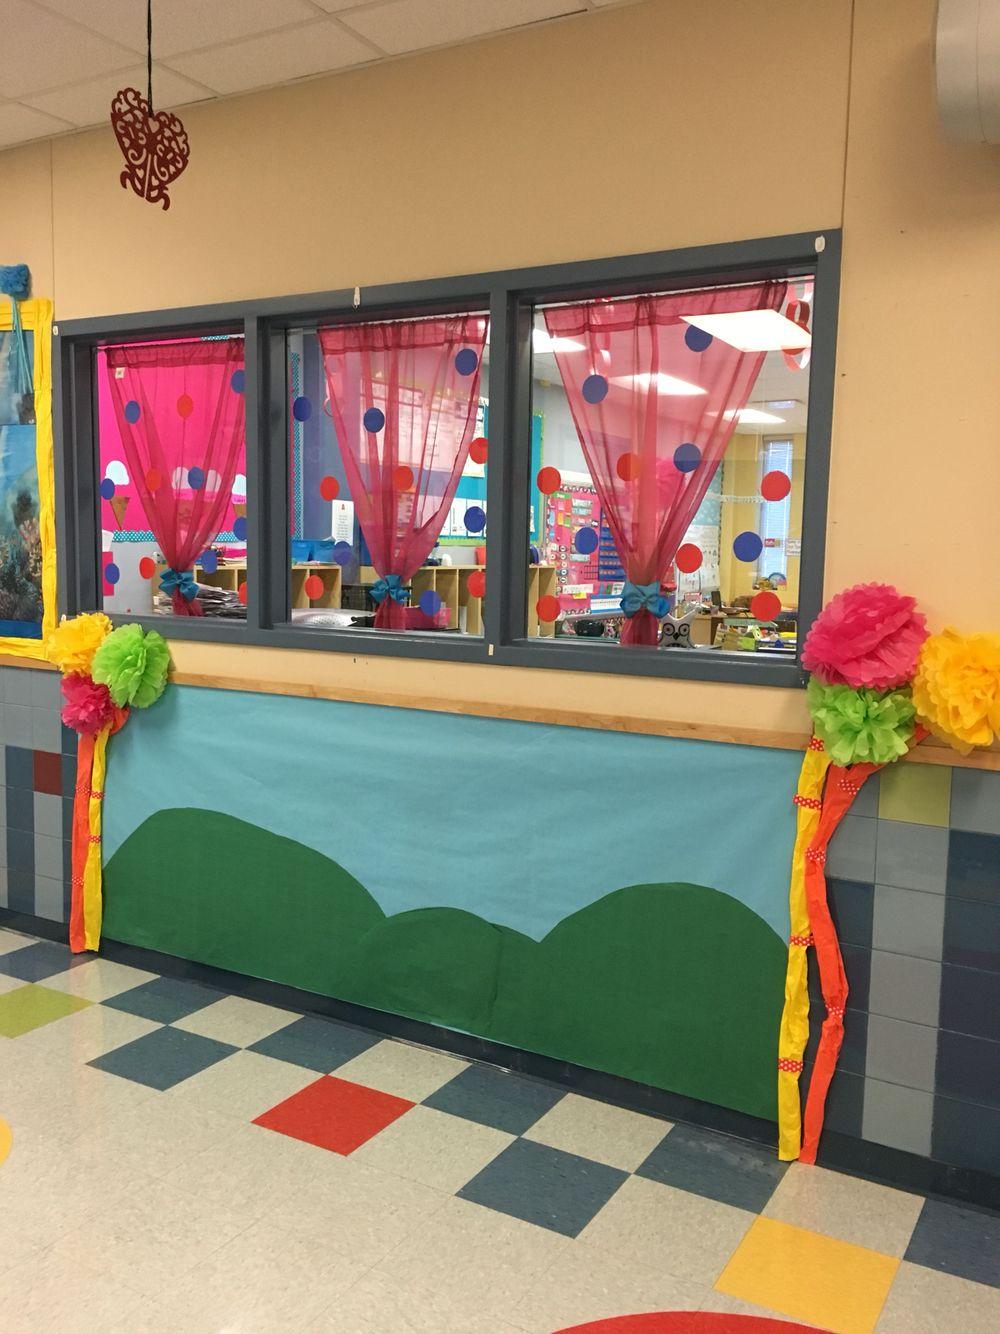 Dr. Seuss classroom ideas